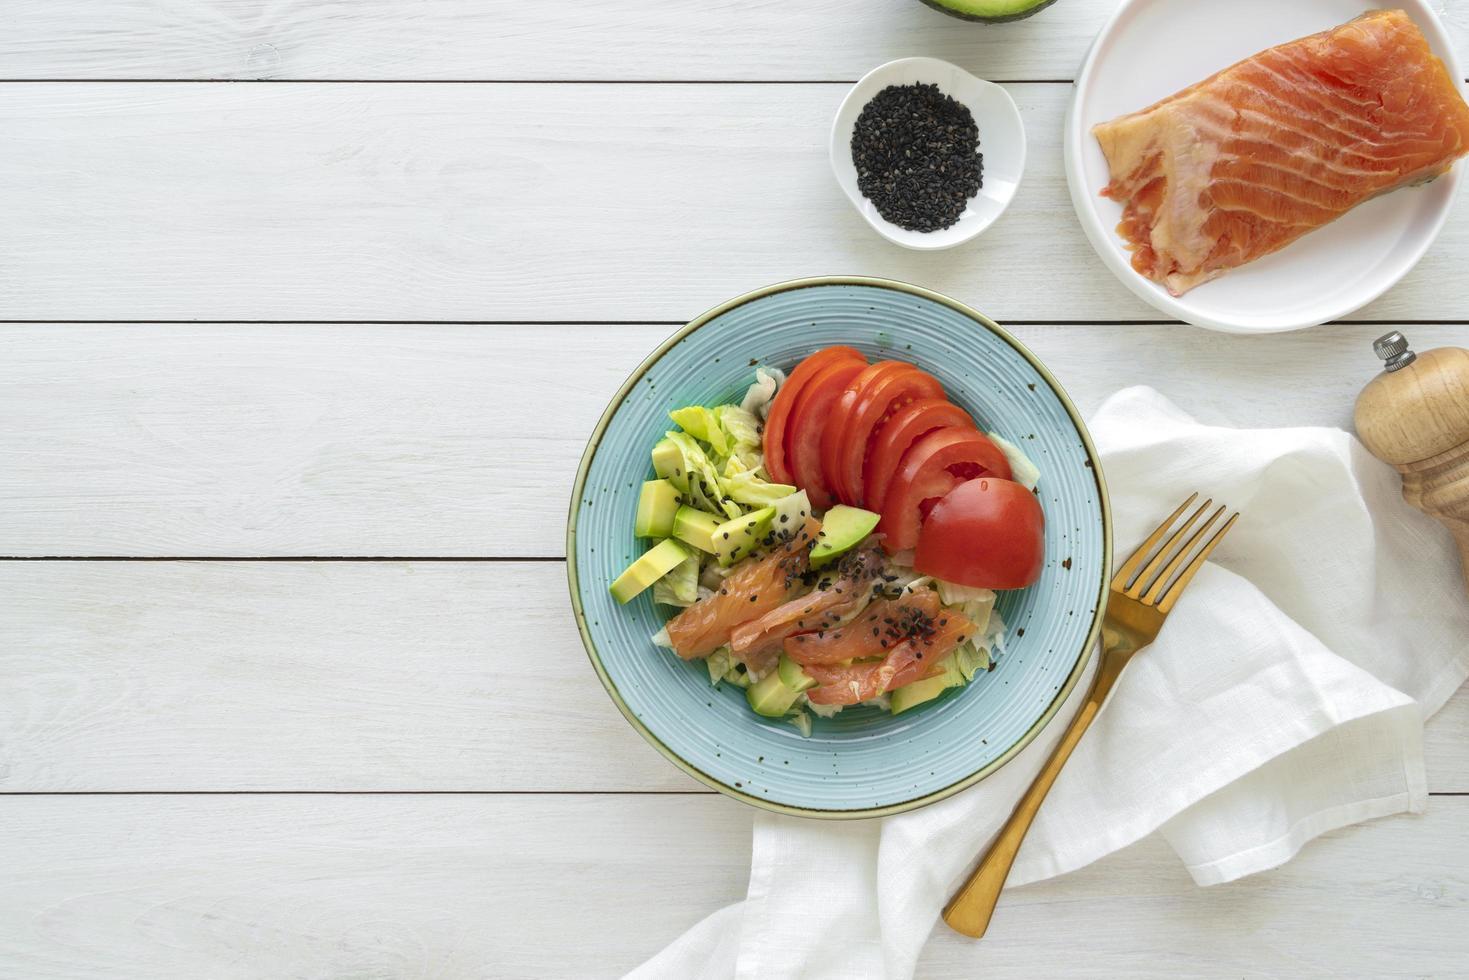 Salmon filet with avocado salad photo